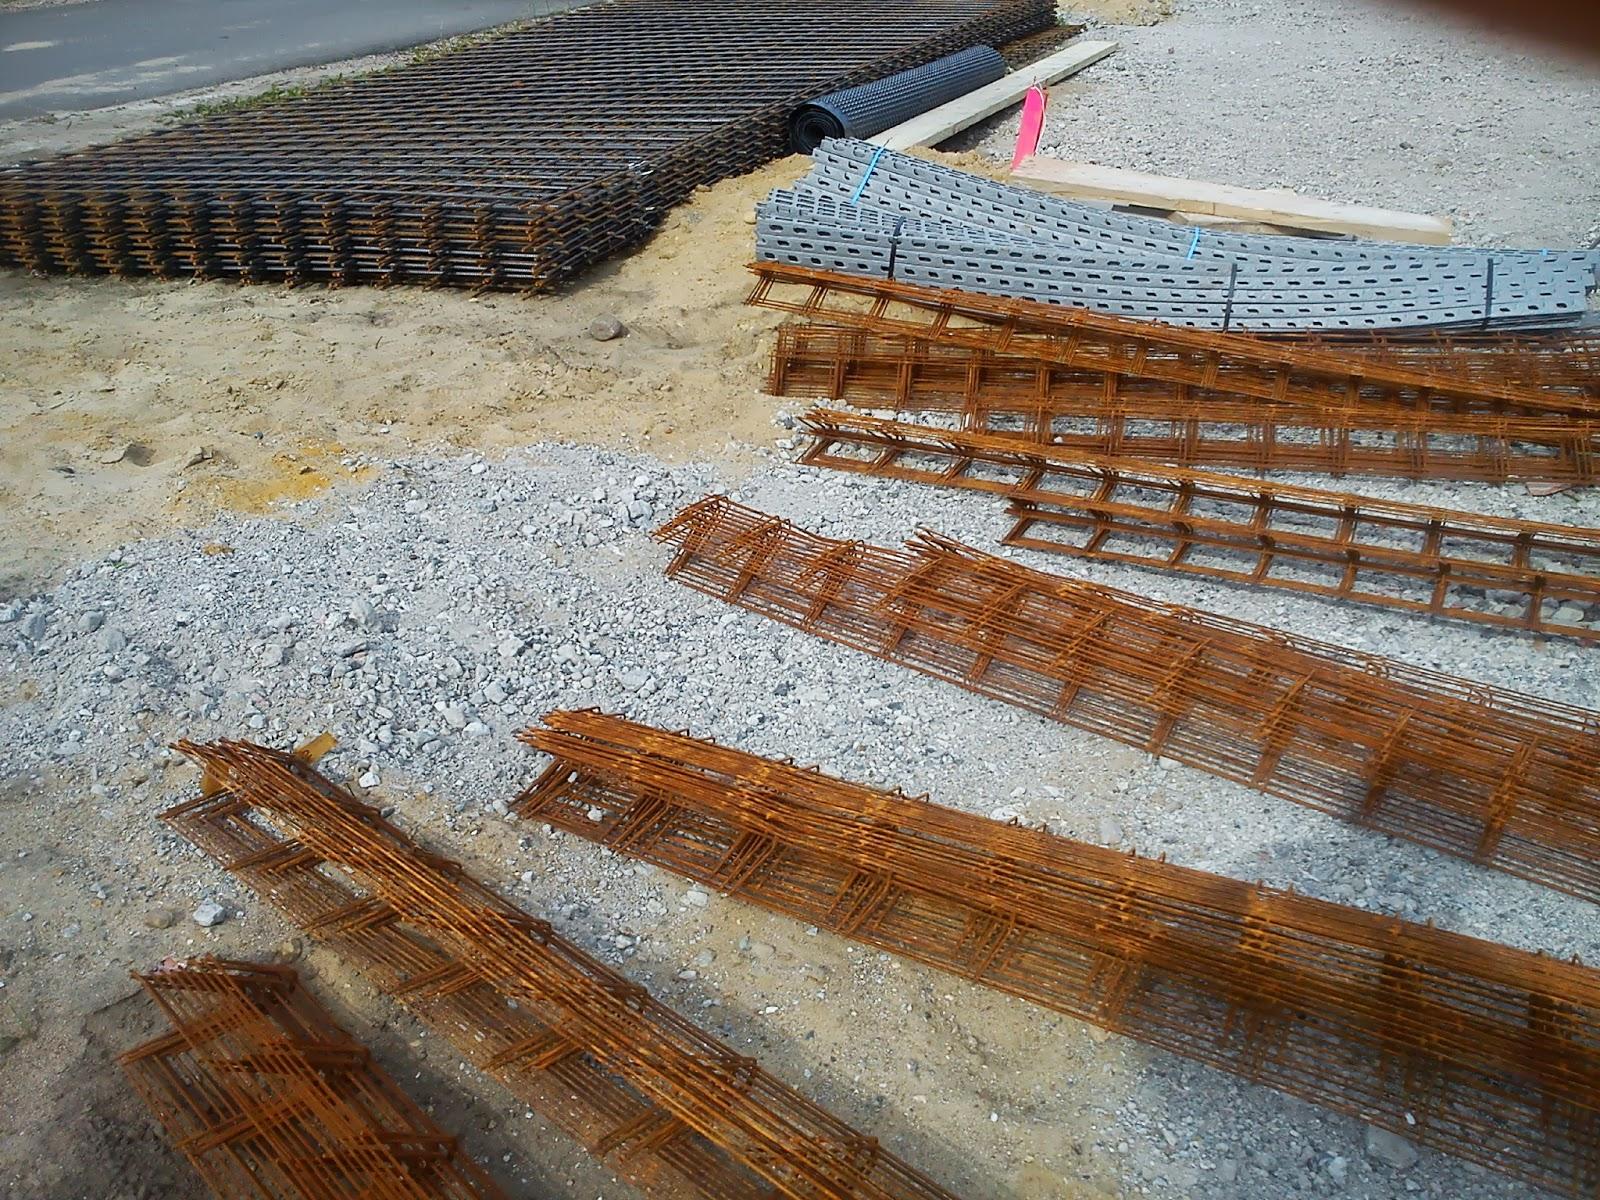 nurda im domherrengarten die bodenplatte der beton kommt. Black Bedroom Furniture Sets. Home Design Ideas